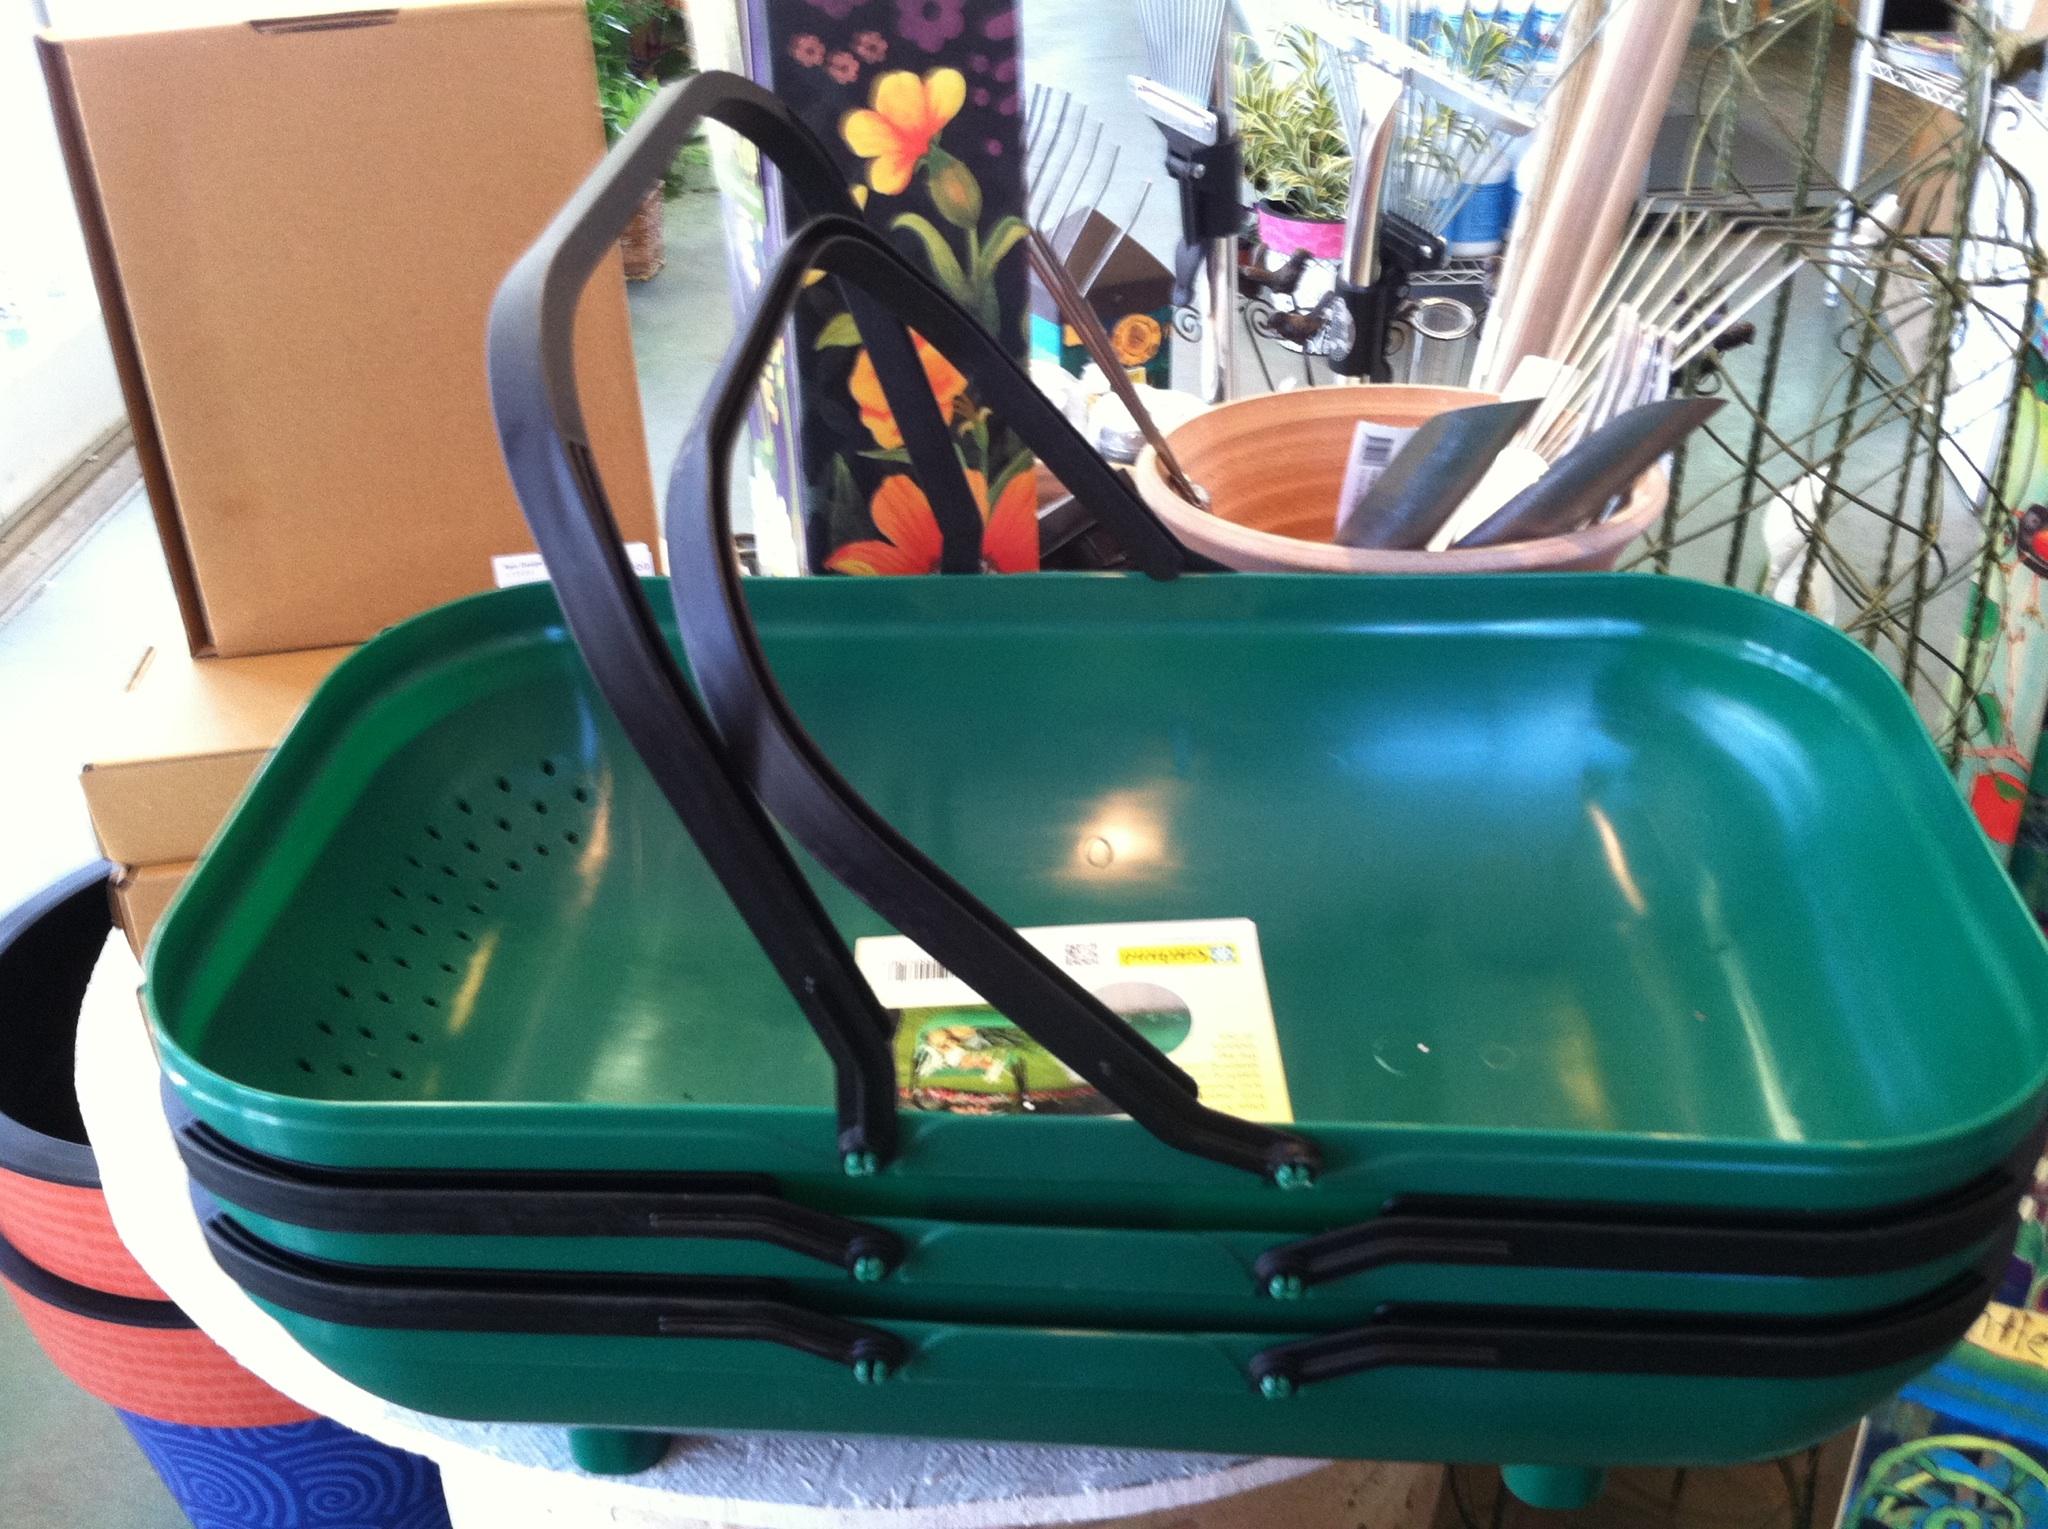 7-harvest-basket-or-tool-caddy